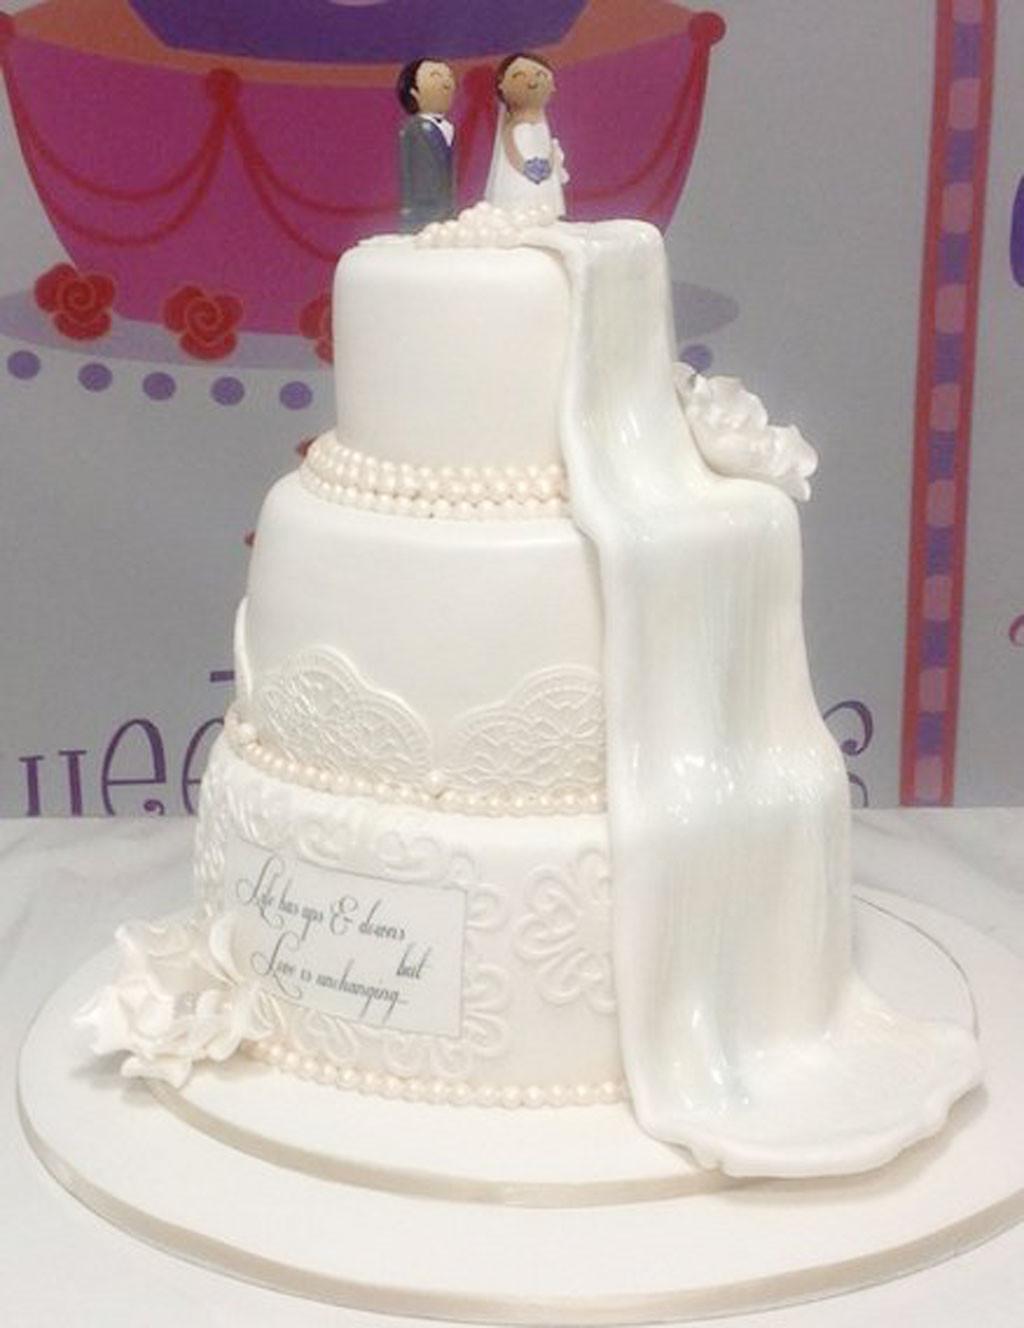 Waterfalls Wedding Cakes  Waterfall Wedding Cake Ideas Wedding Cake Cake Ideas by